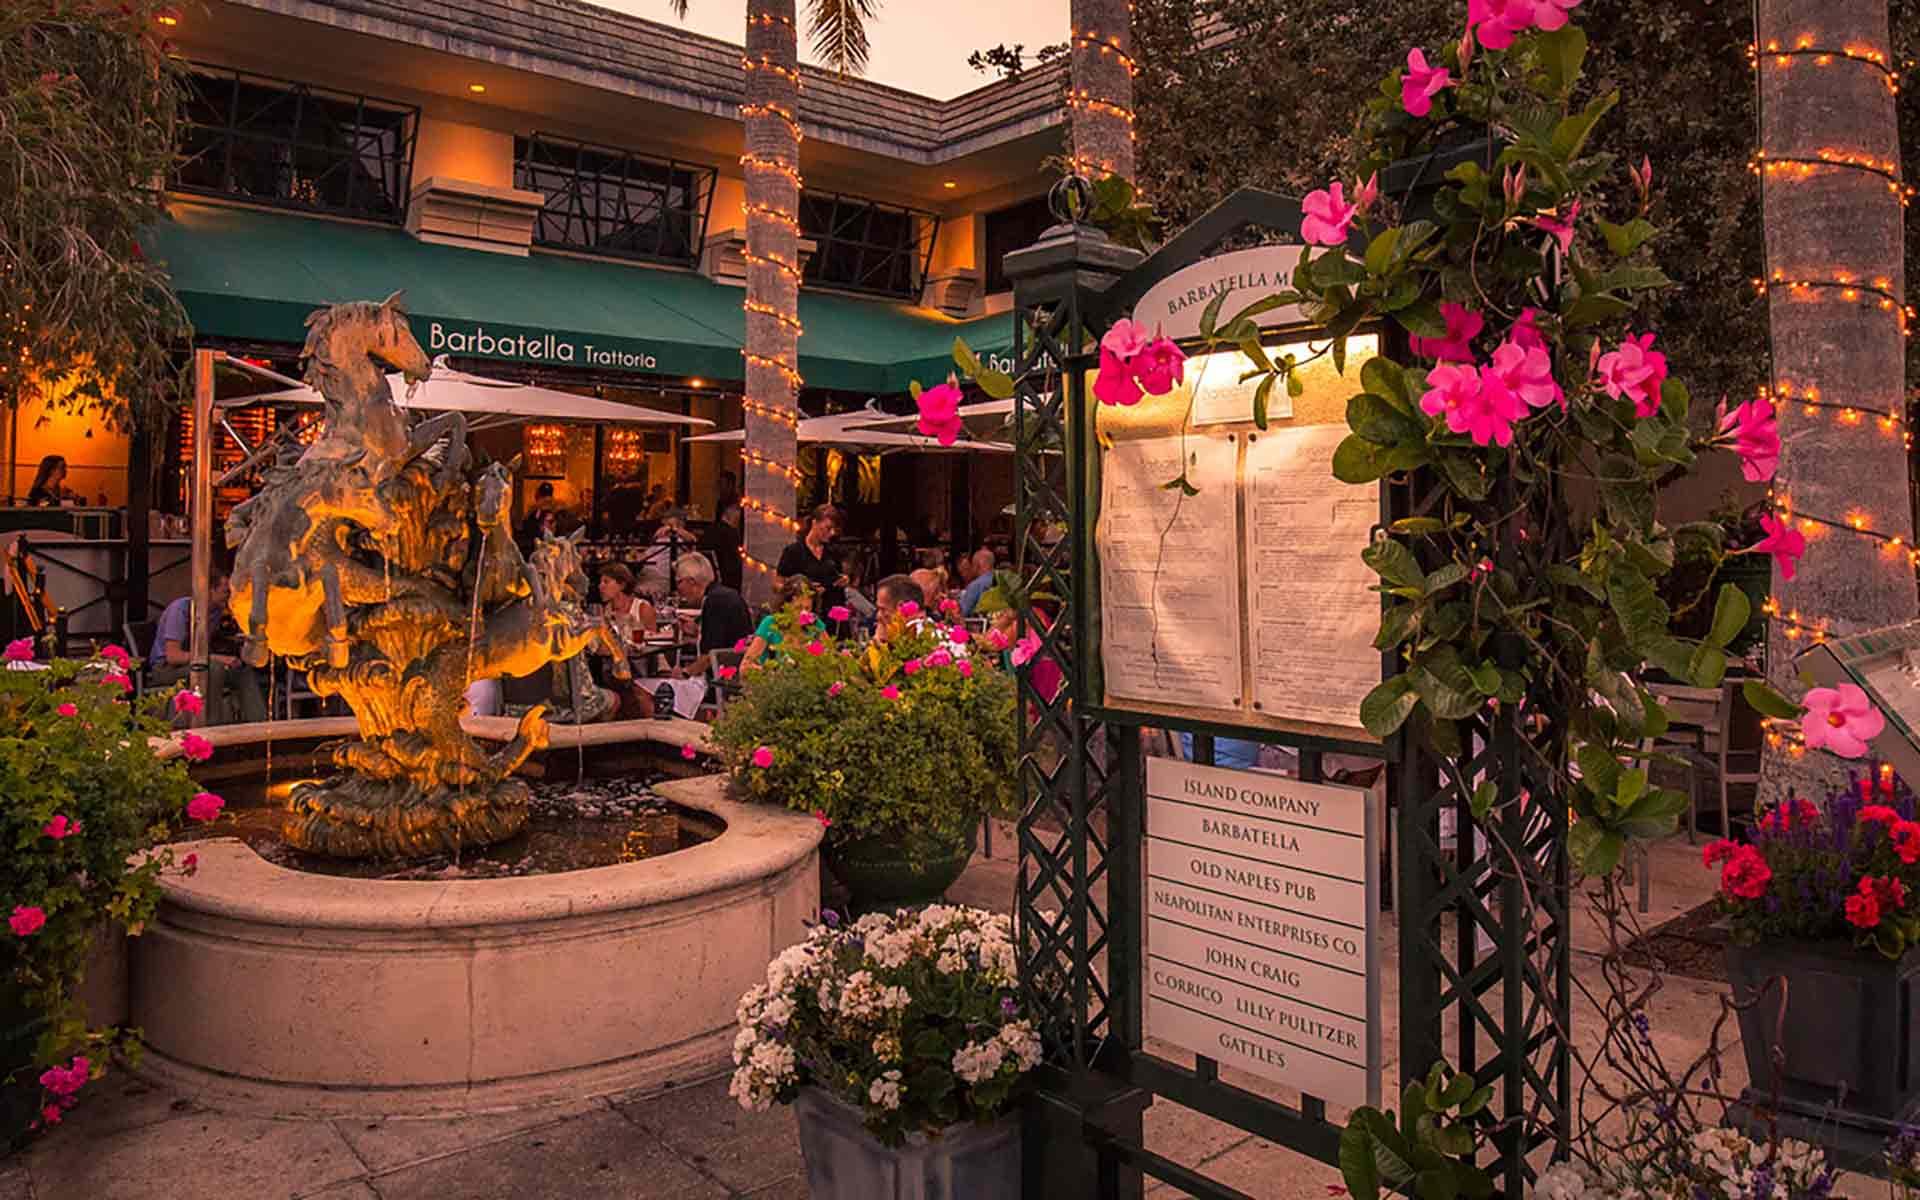 Barbatella Courtyard Evening